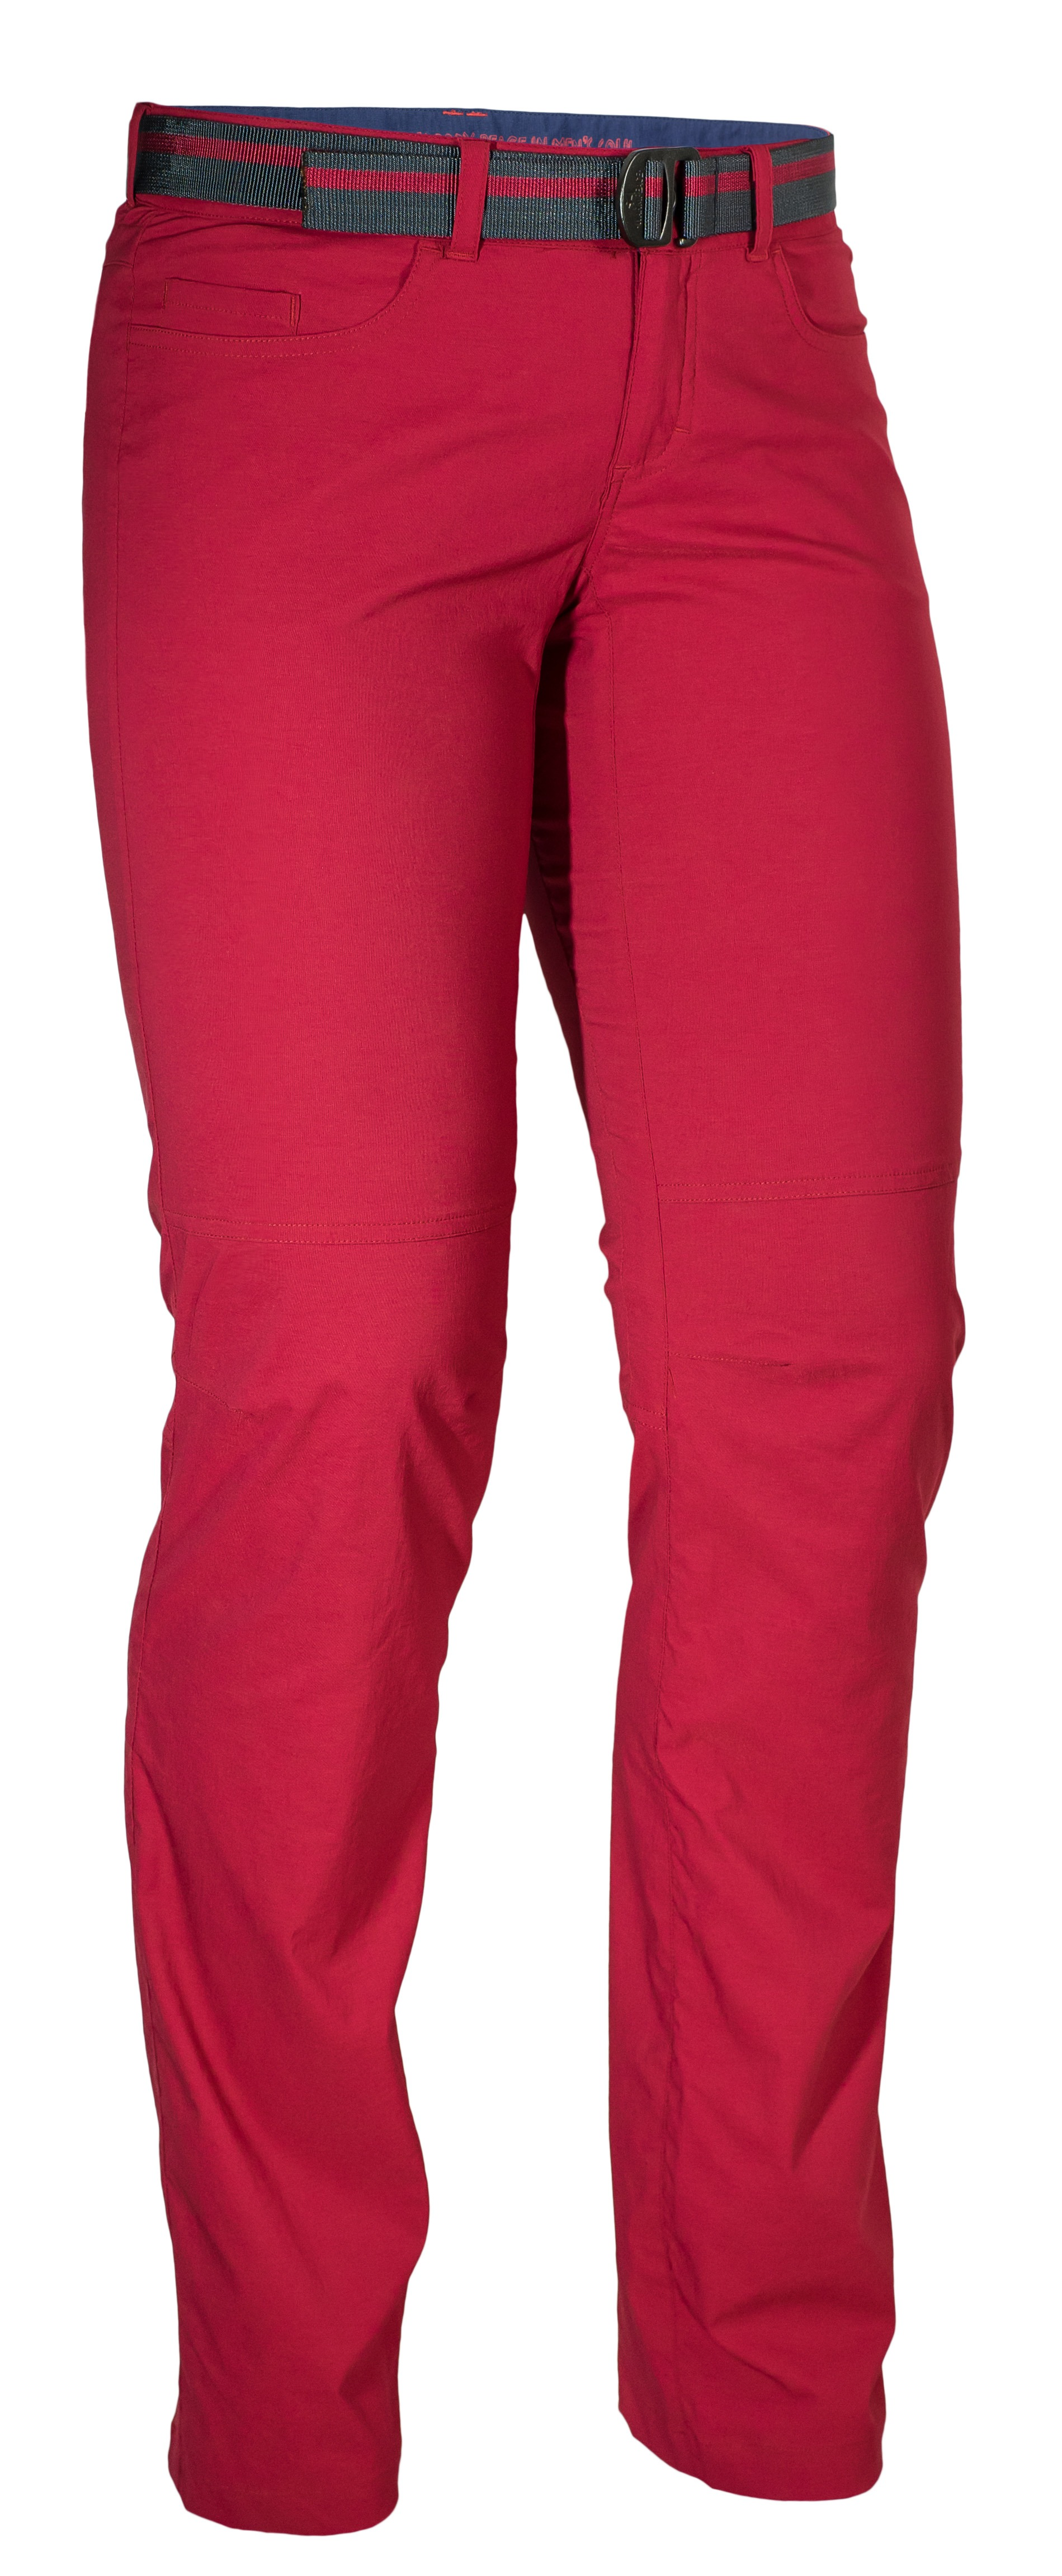 Pantaloni Warmpeace Atlanta Lady - Rosu